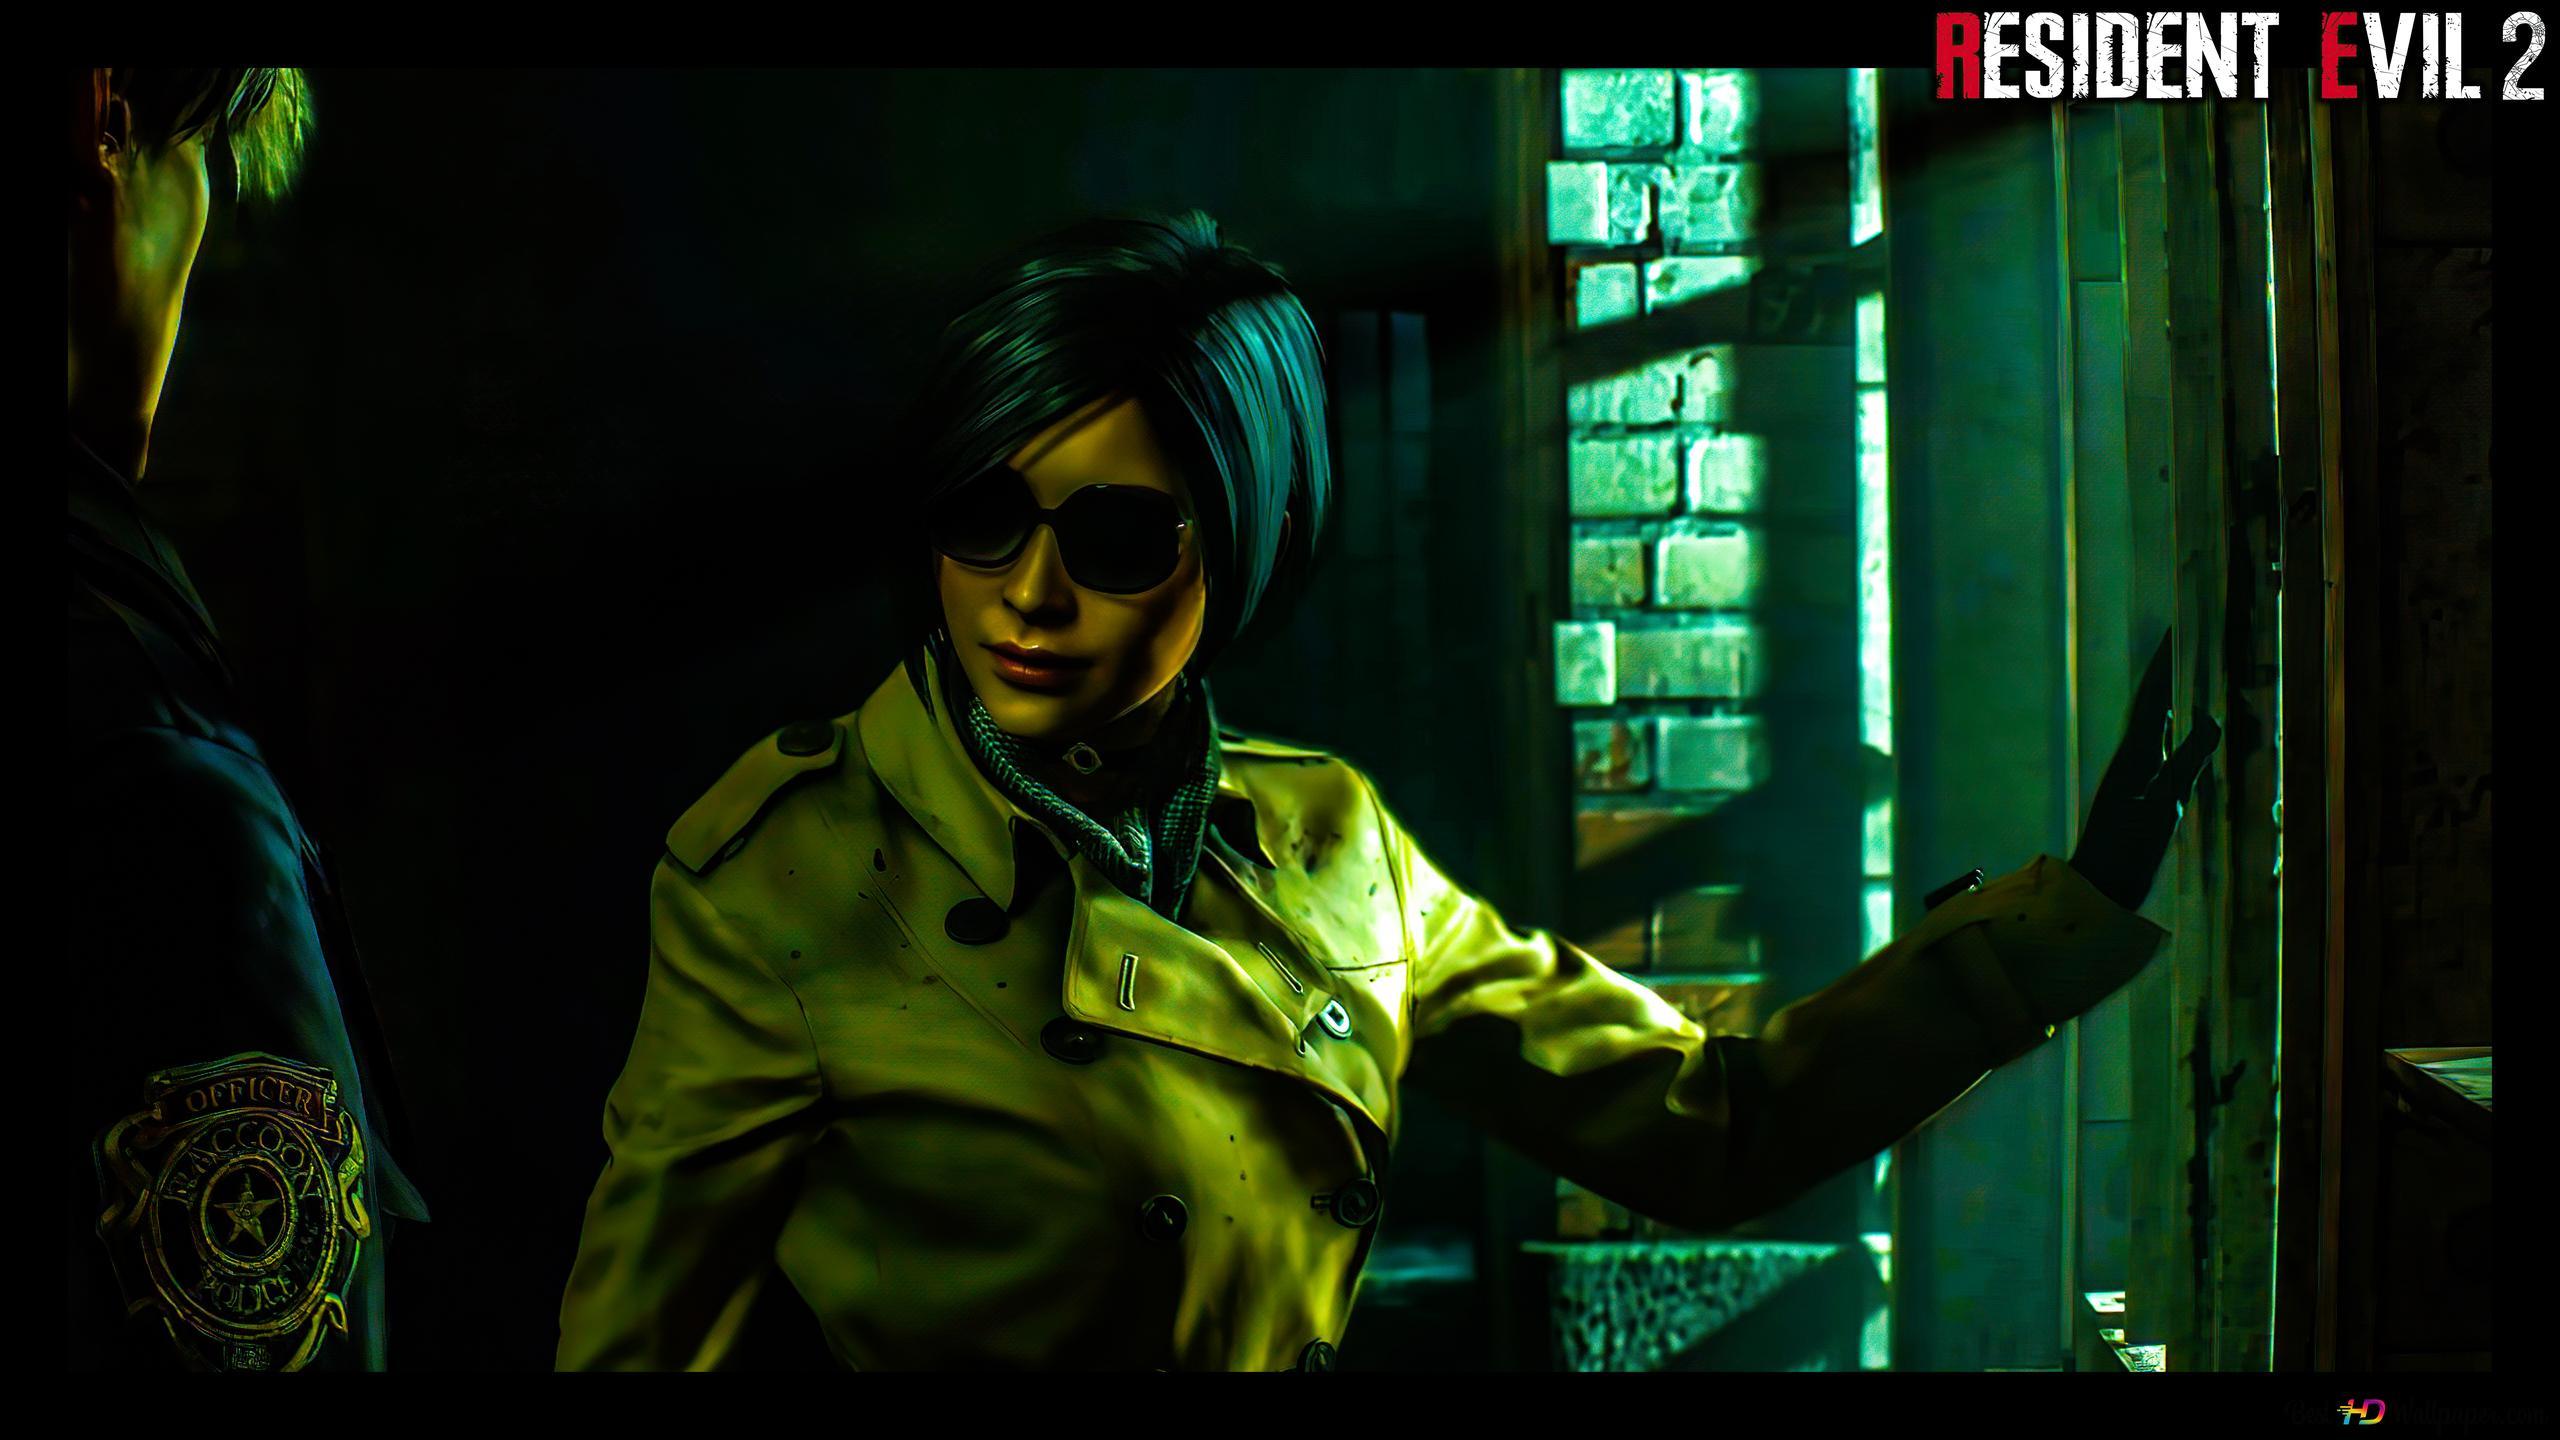 Resident Evil 2 Remake Ada Leon Jail 8k 4k Hd Wallpaper Download